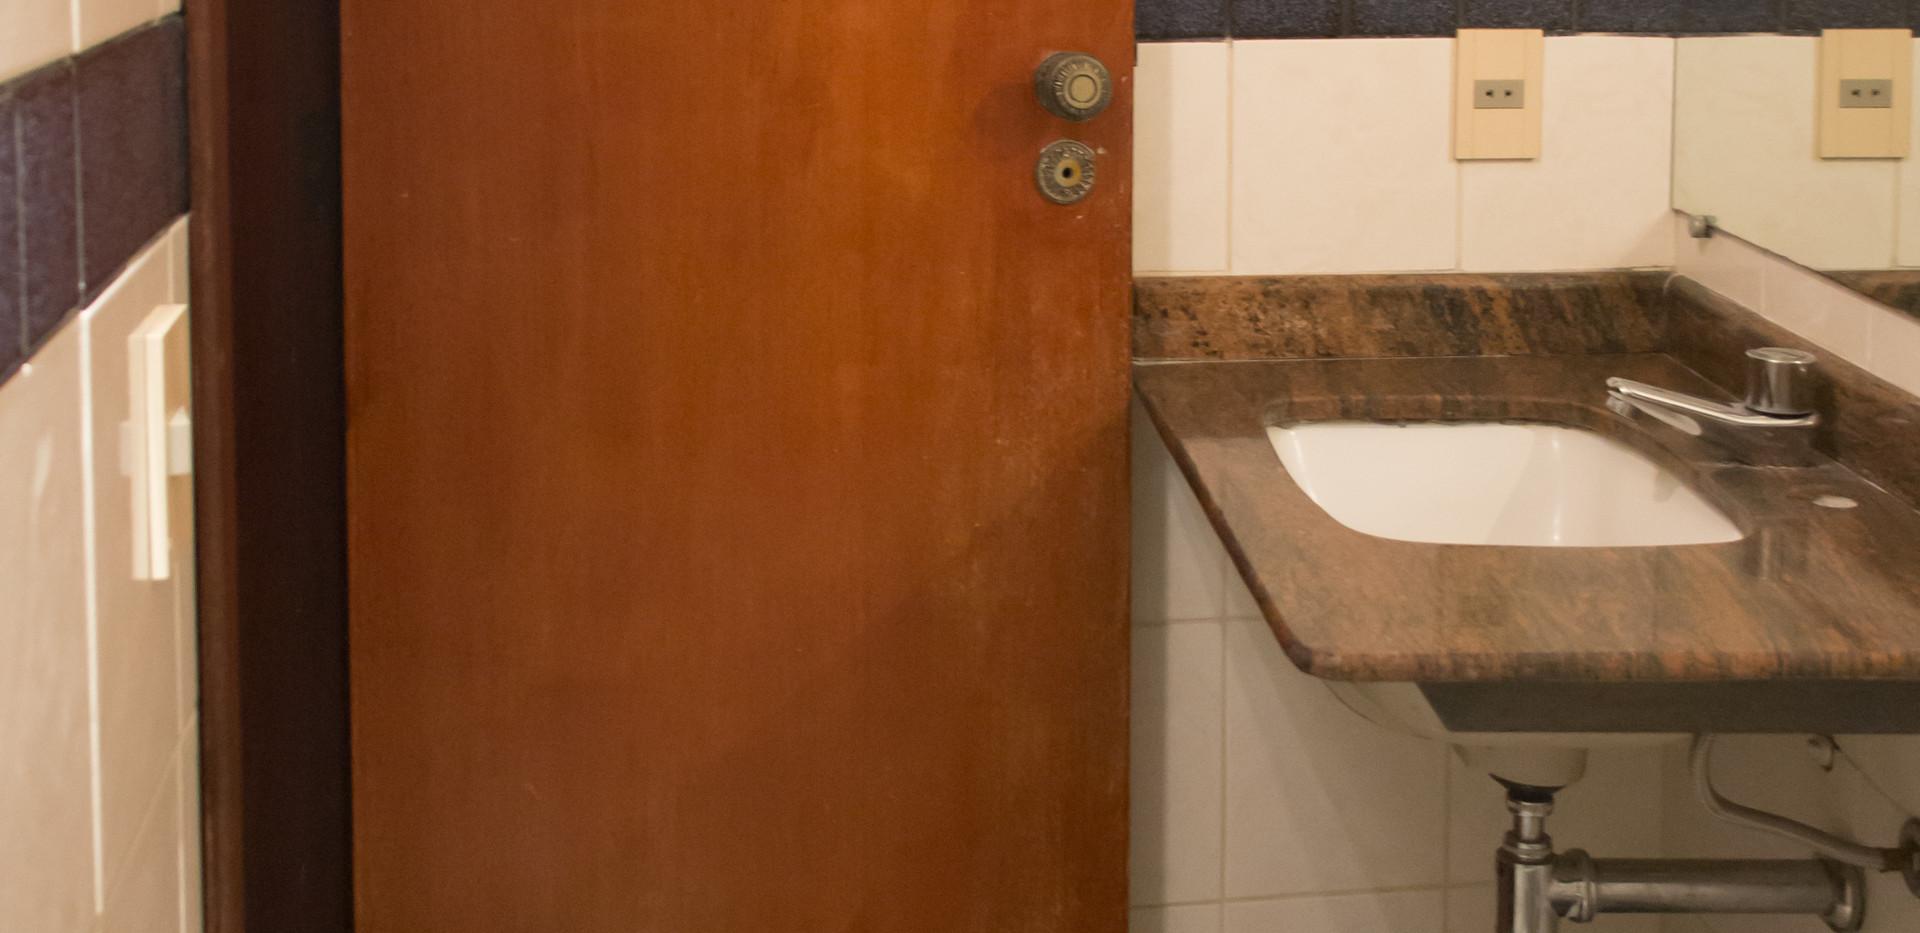 IMG_2900 banheiro contraposicao.jpg